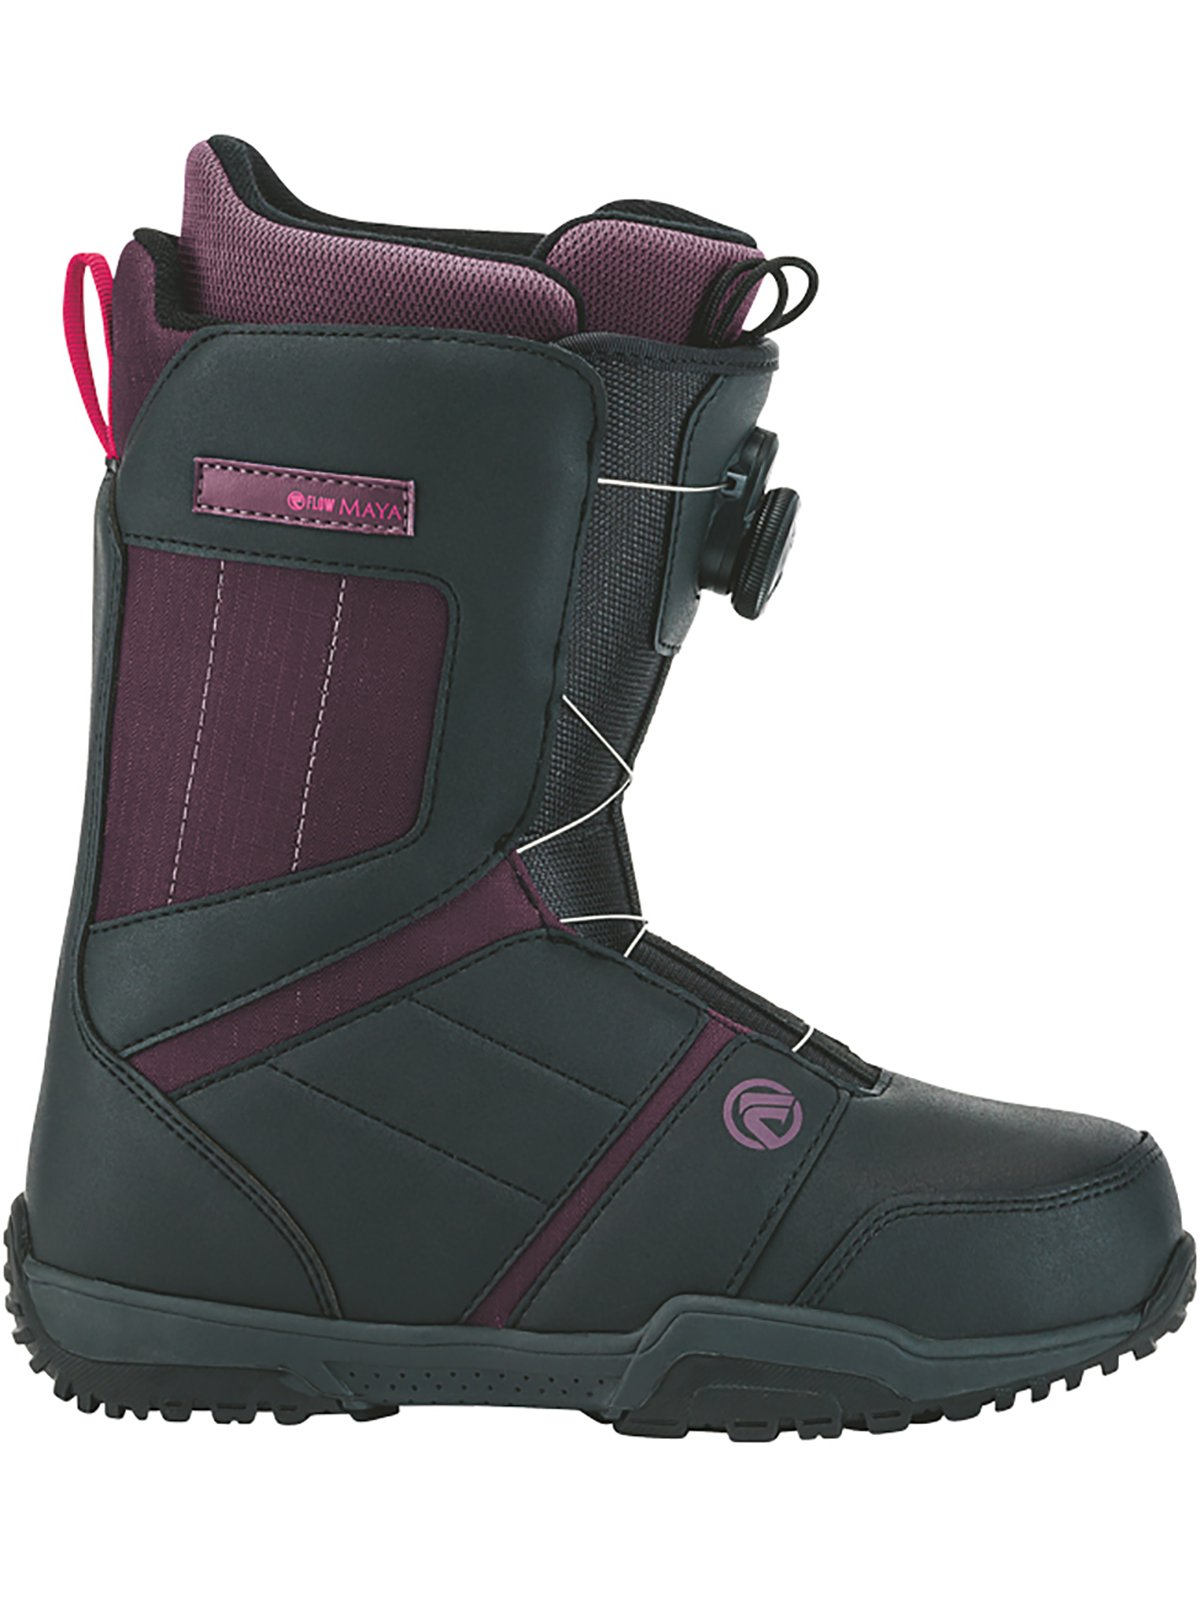 Flow Maya Boa Senior Snowboard Boots Charcoal, Purple